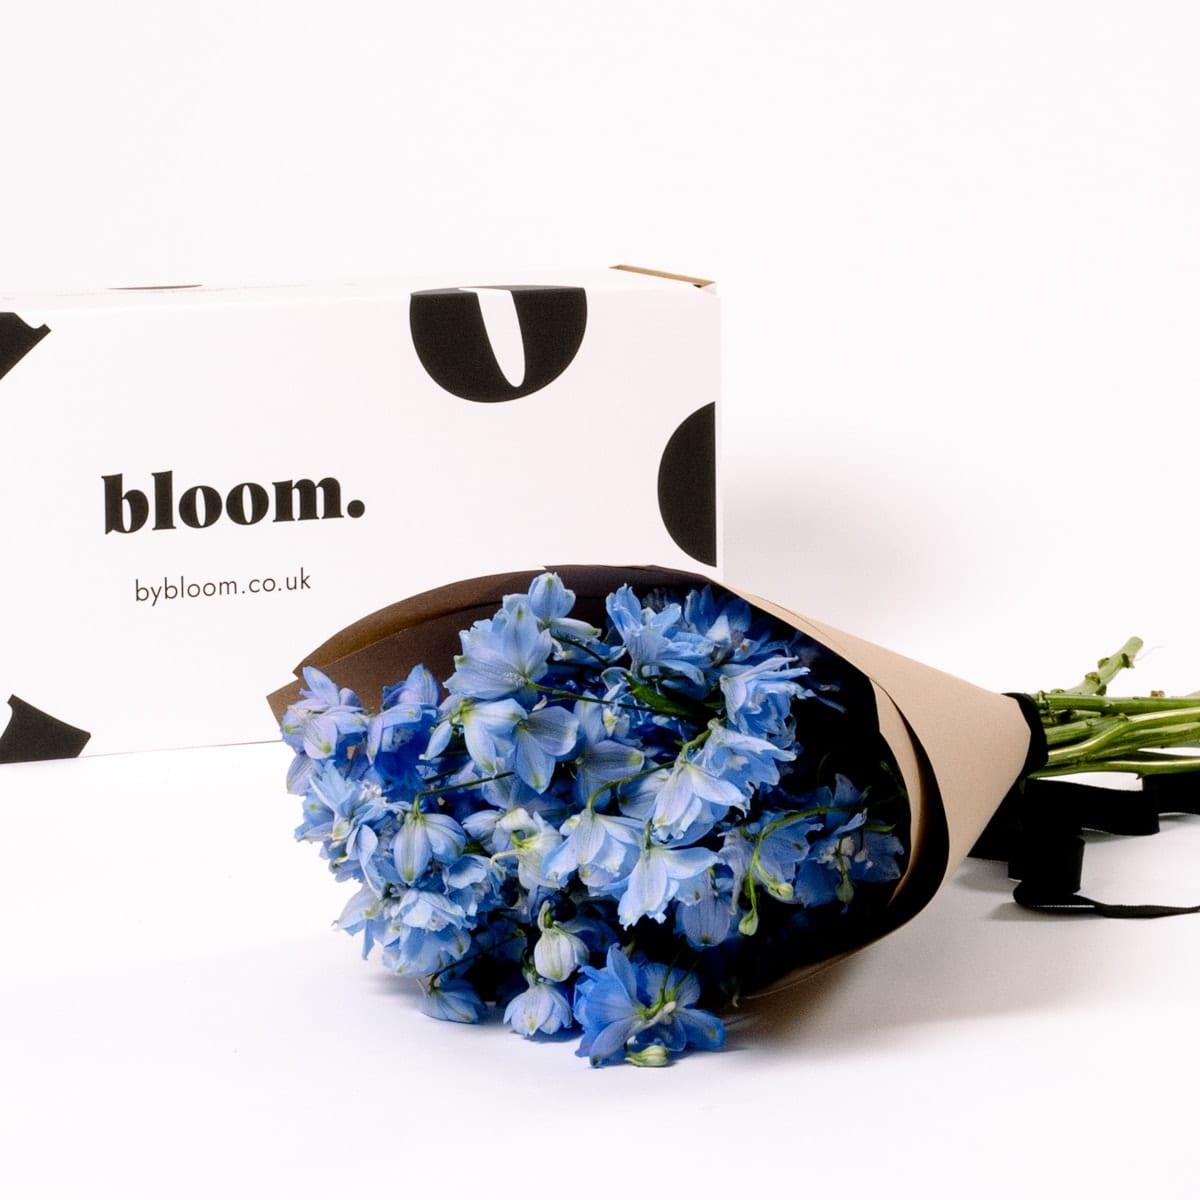 Bloom Flower Delivery | Glacier Blue Delphinium